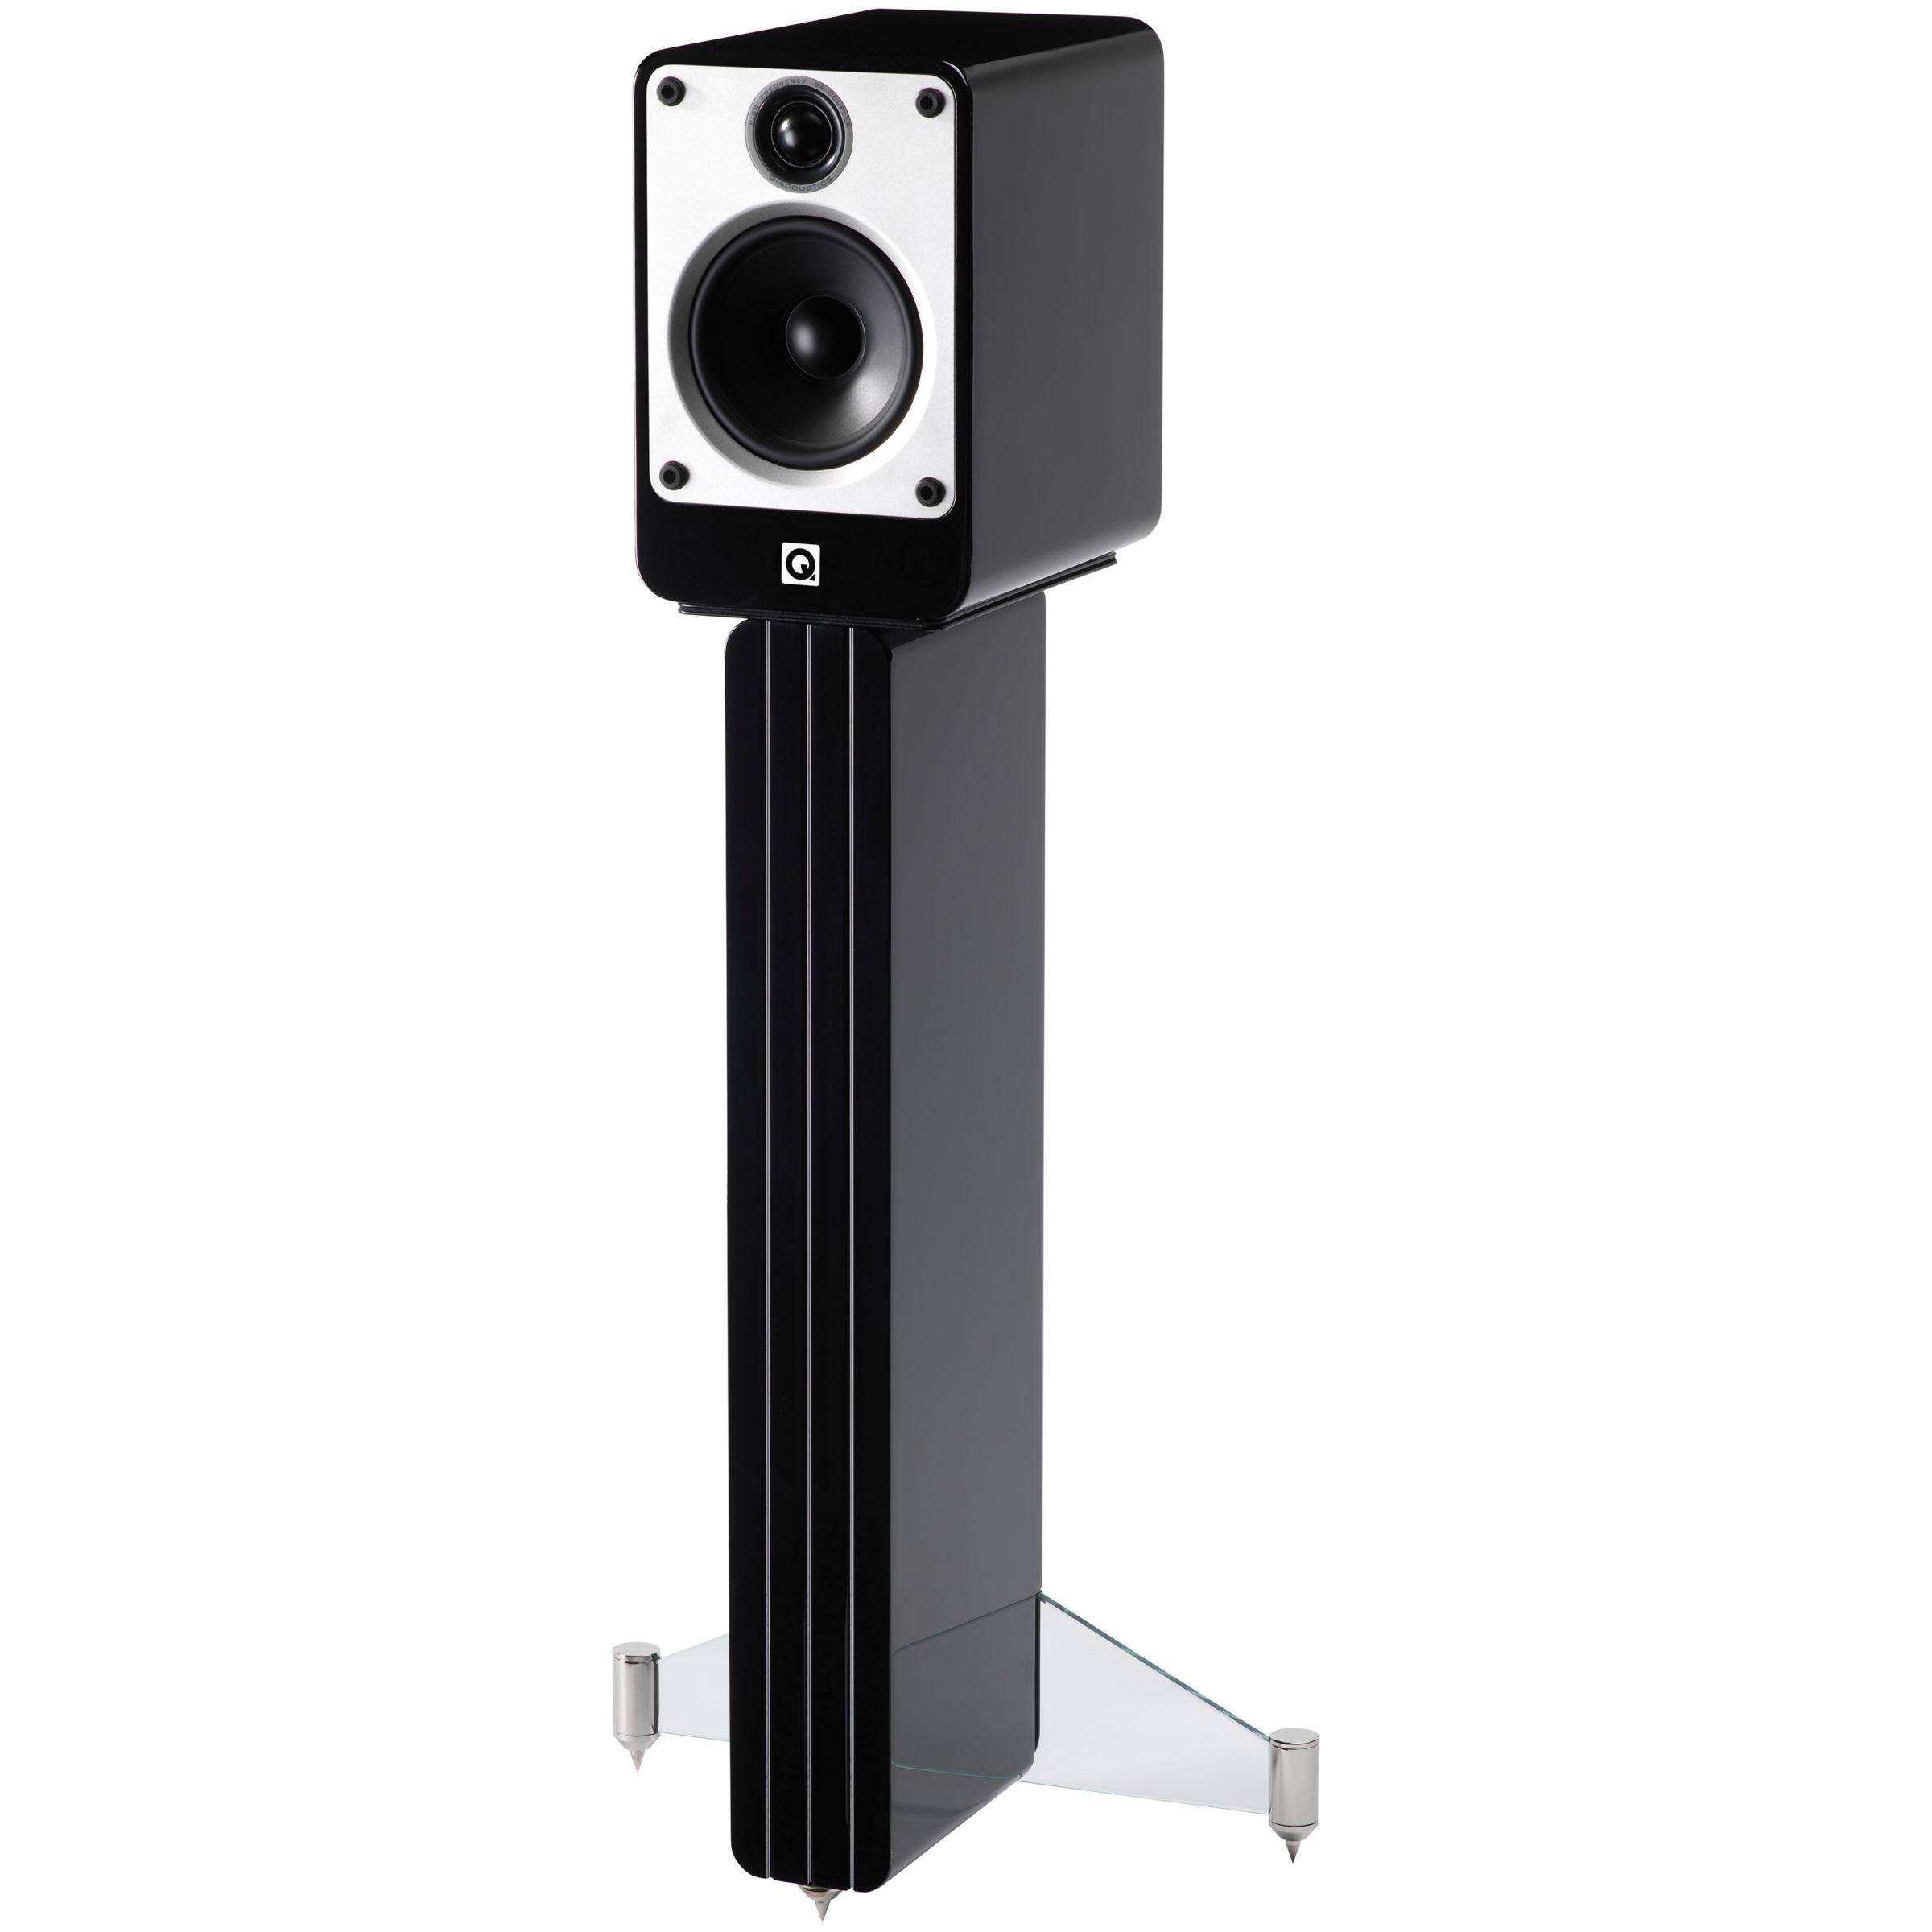 Q Acoustics Q Acoustics Concept 20 Speaker Stand